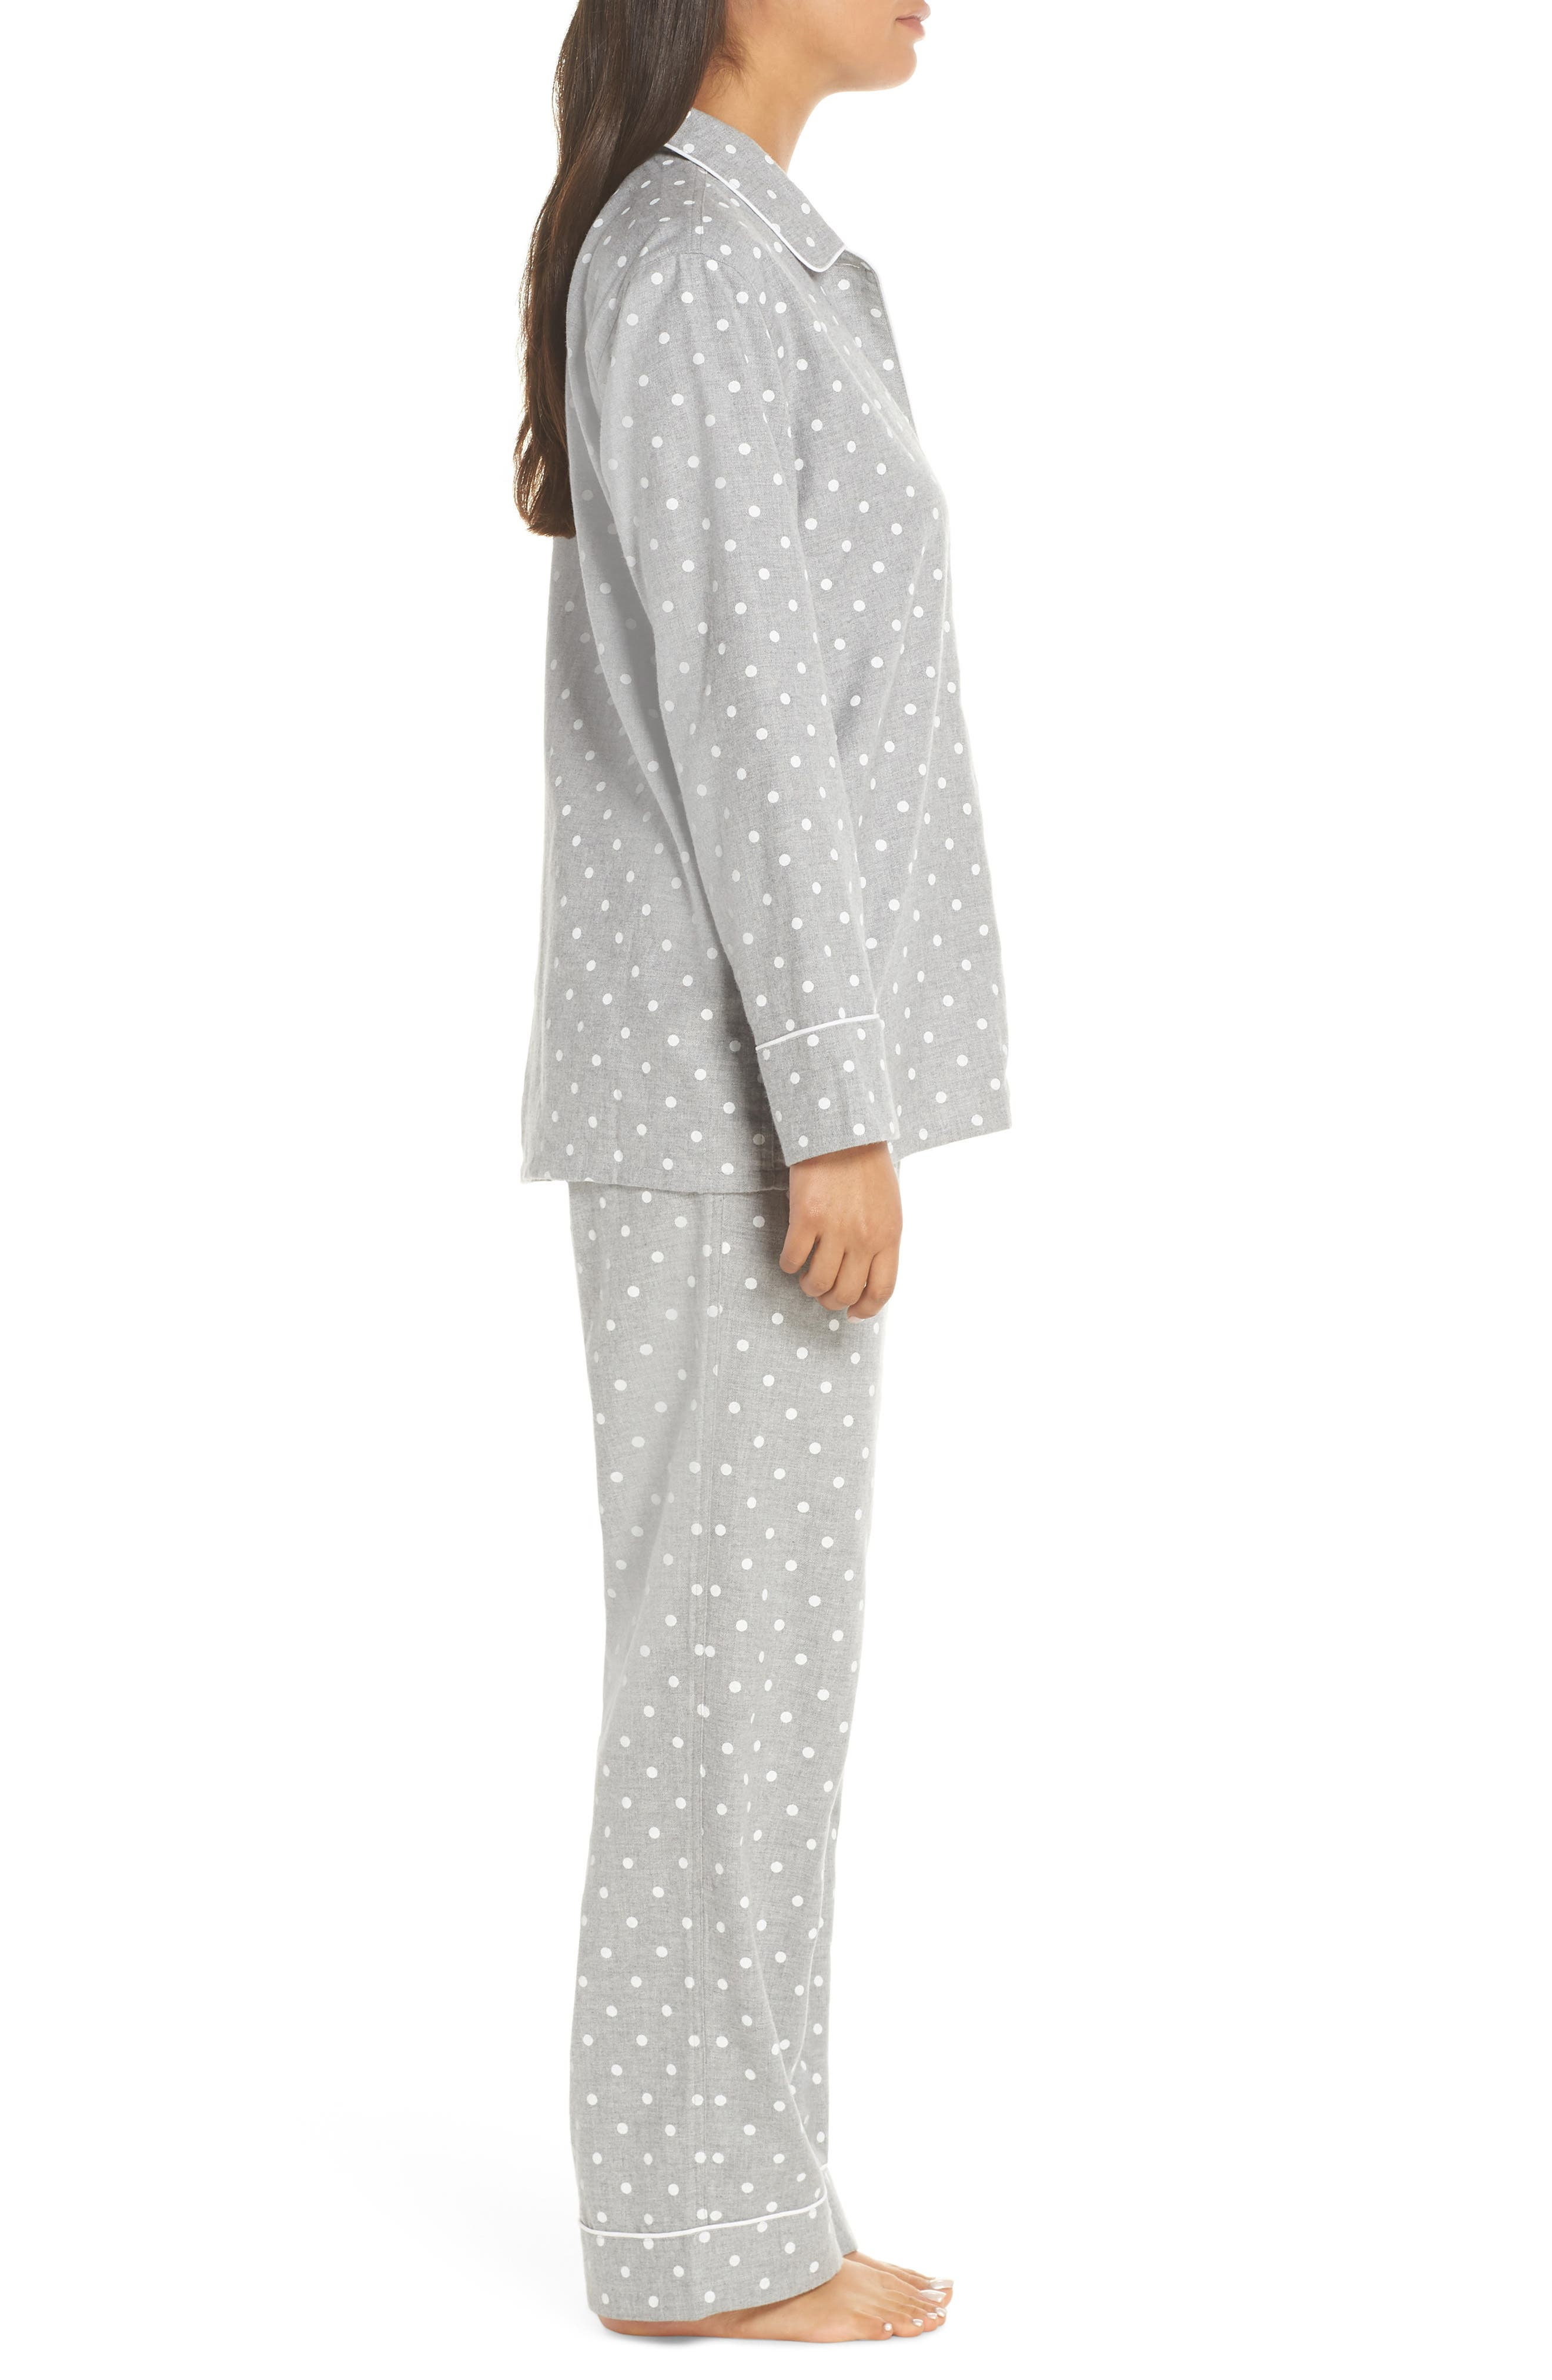 Flannel Pajamas,                             Alternate thumbnail 3, color,                             023